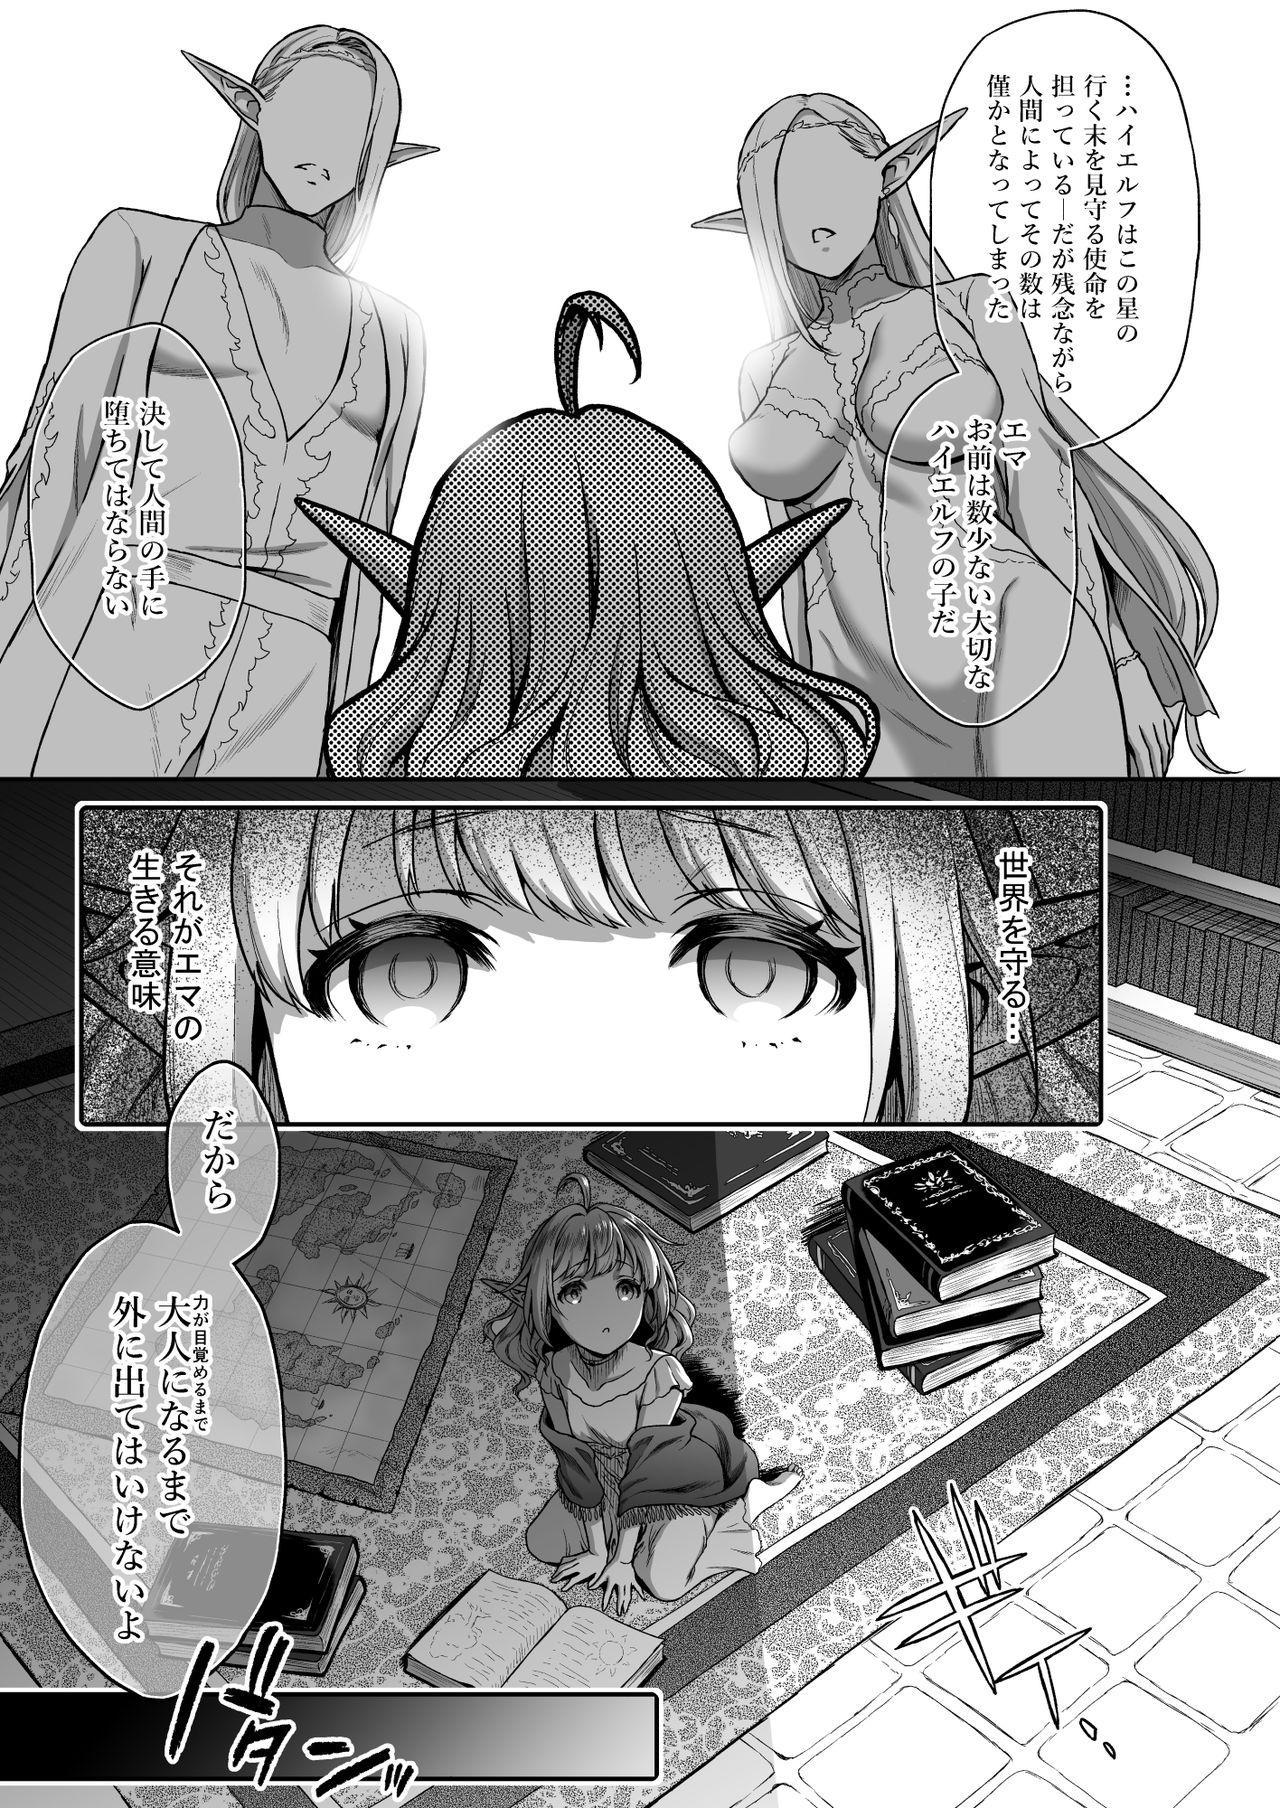 Tasogare no Shou Elf 4 2